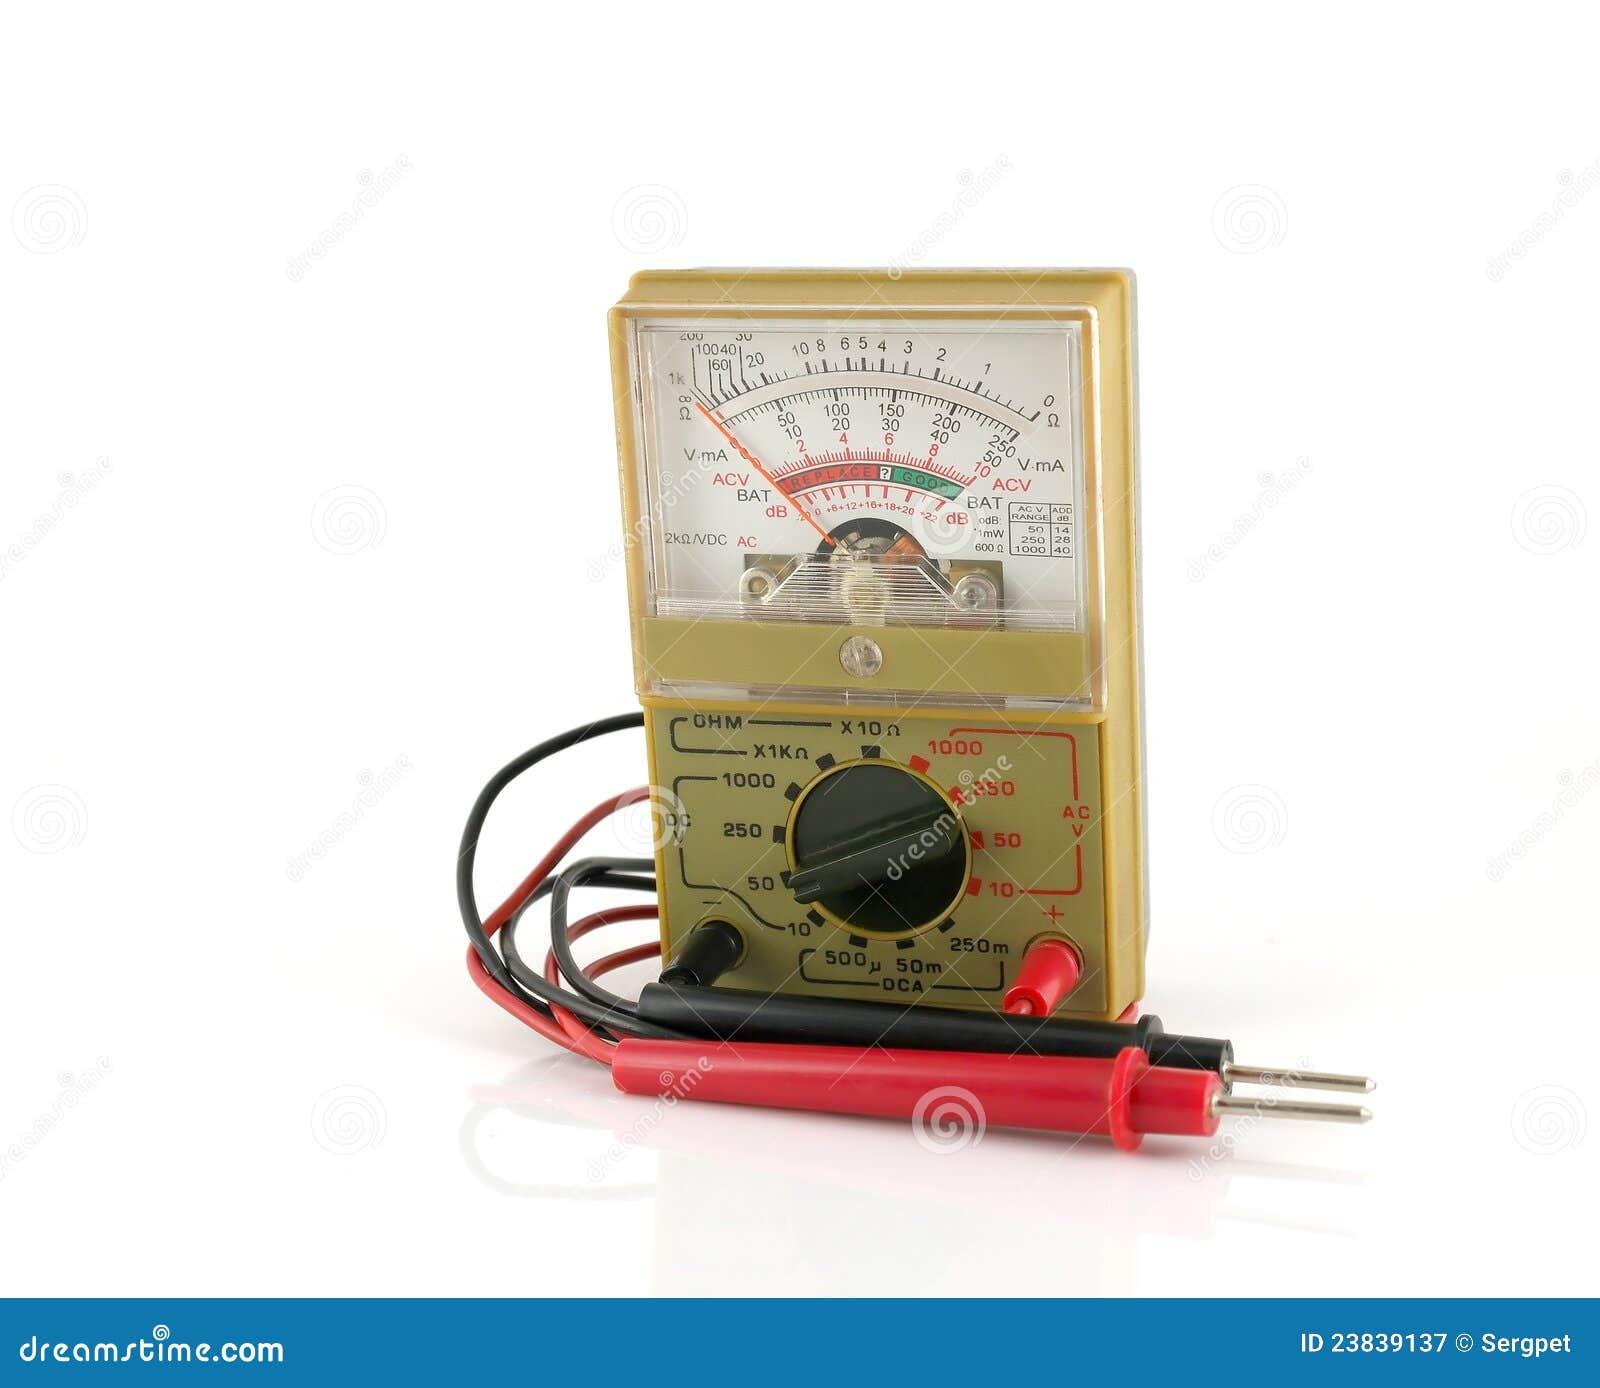 Analog Meter Background : Analog multimeter royalty free stock photography image